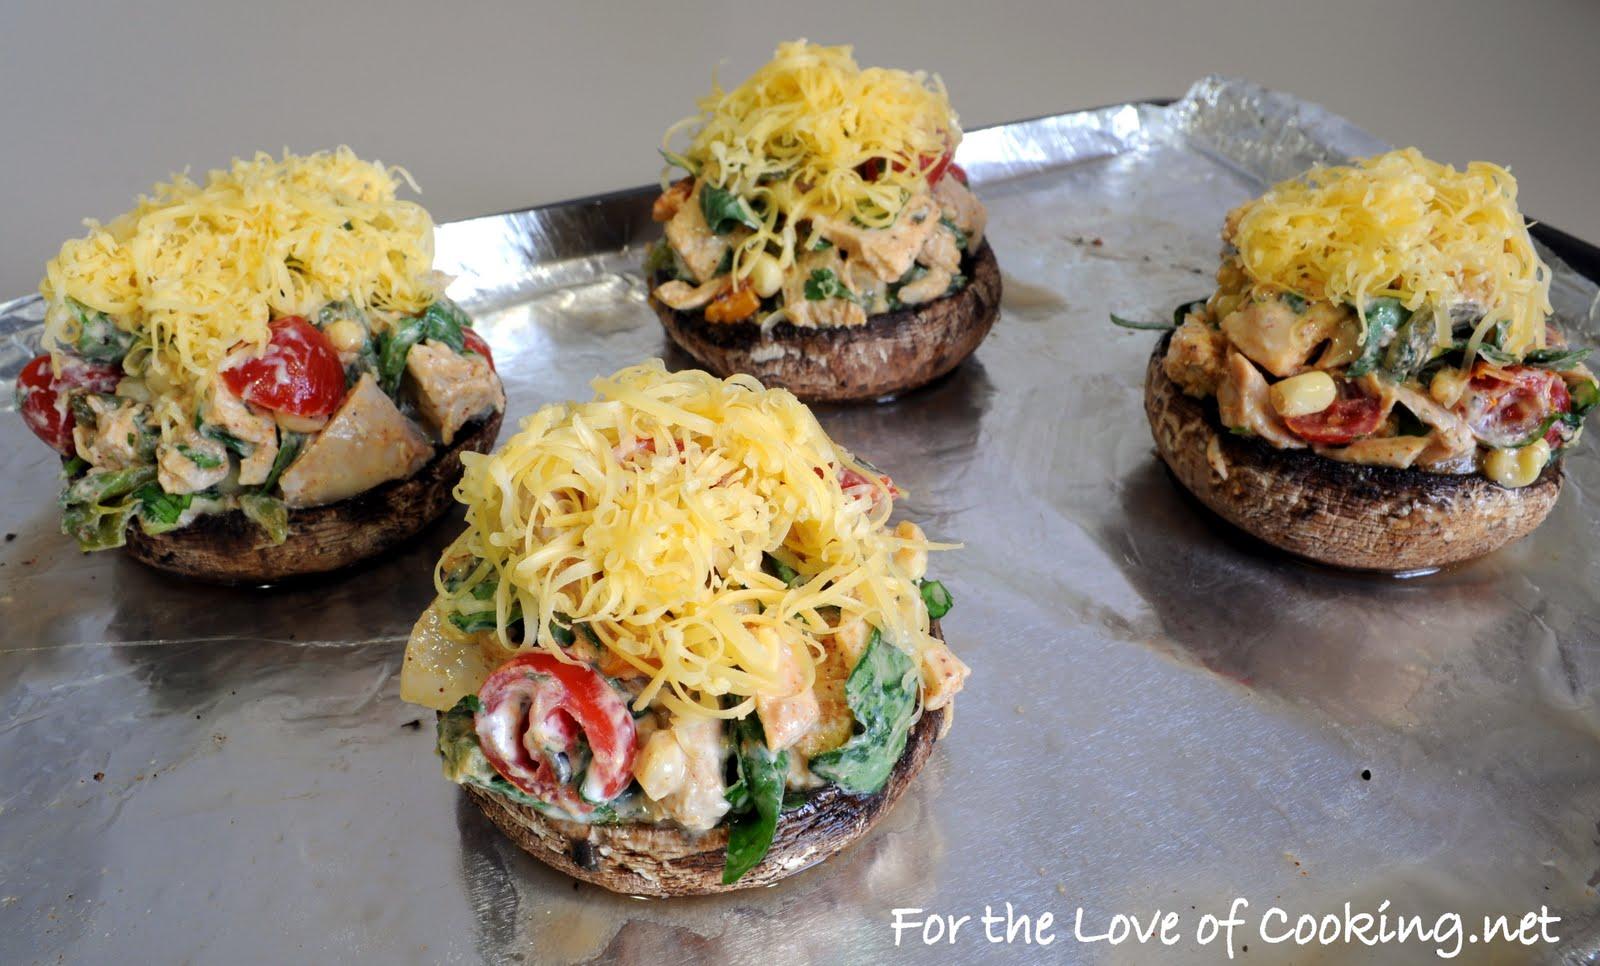 Southwestern Stuffed Portobello Mushrooms | For the Love of Cooking